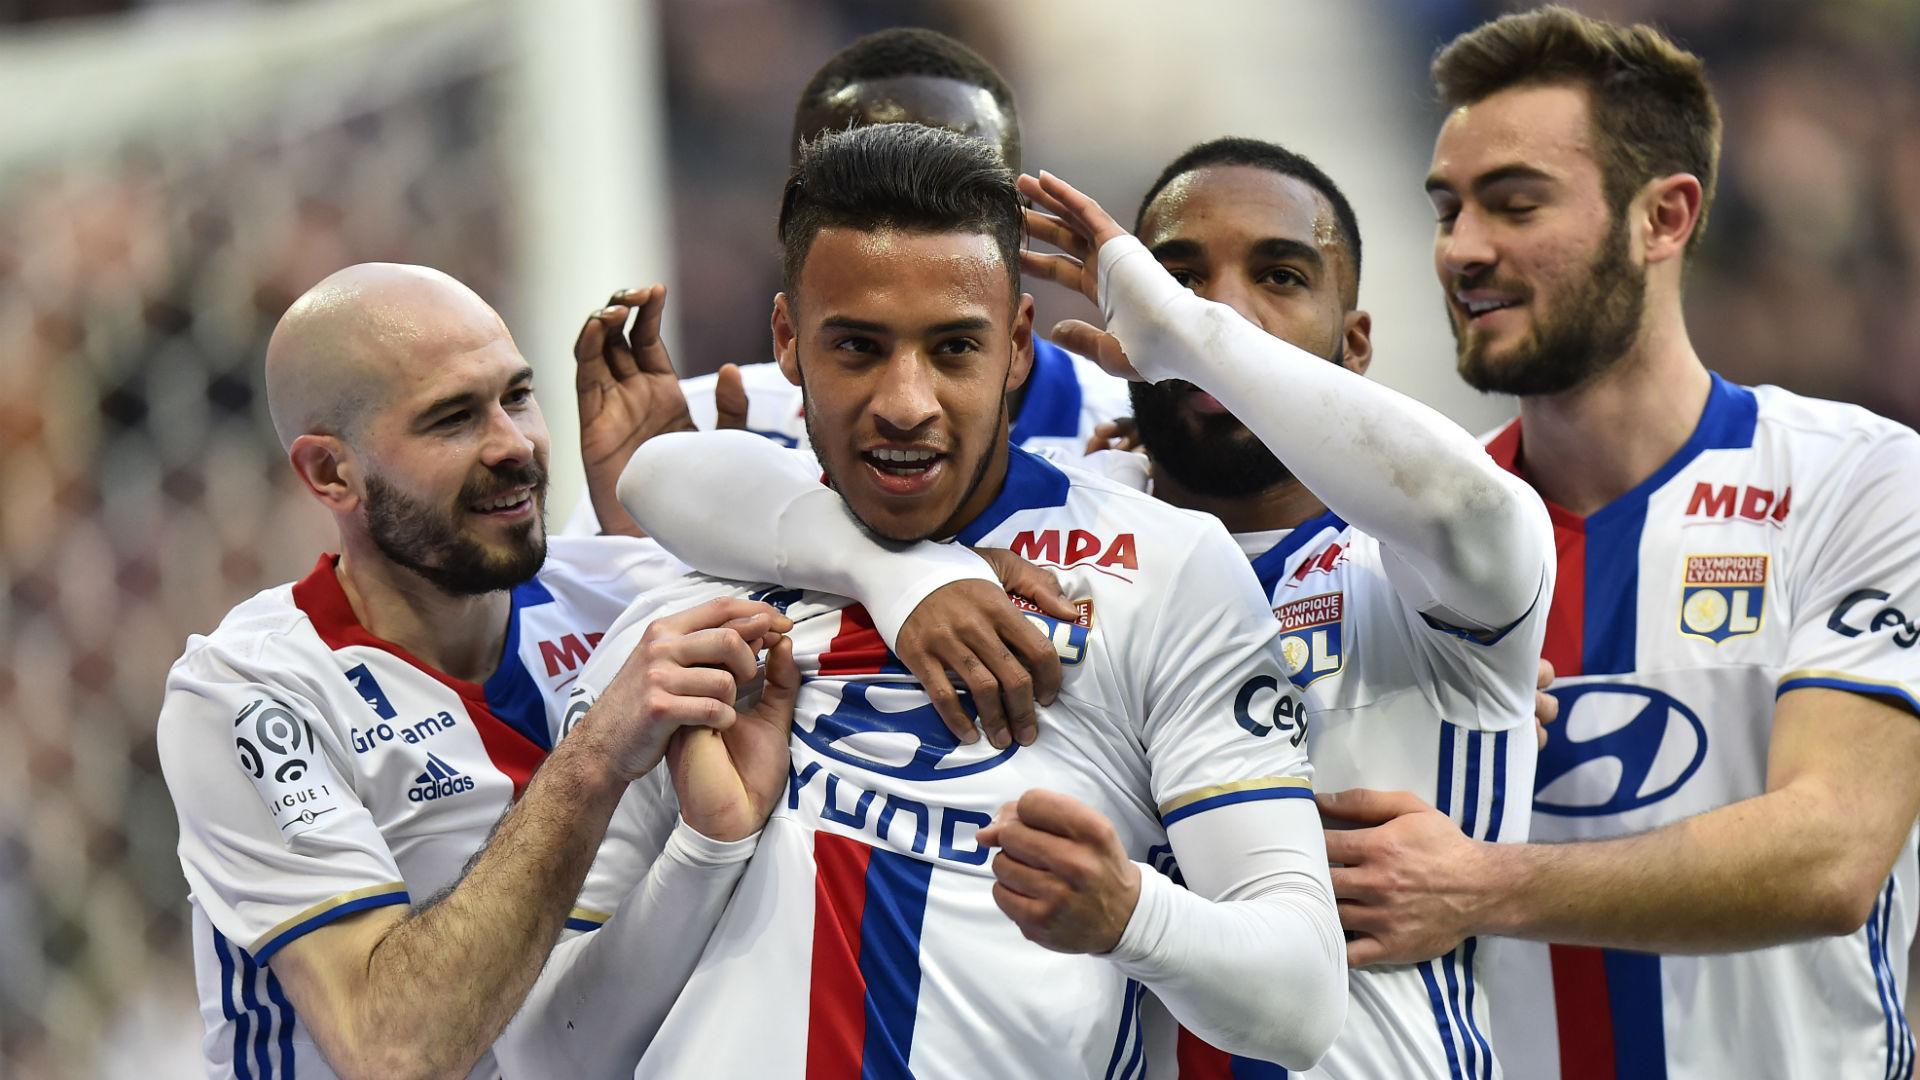 Lyon ace Corentin Tolisso dismisses Juventus rumours